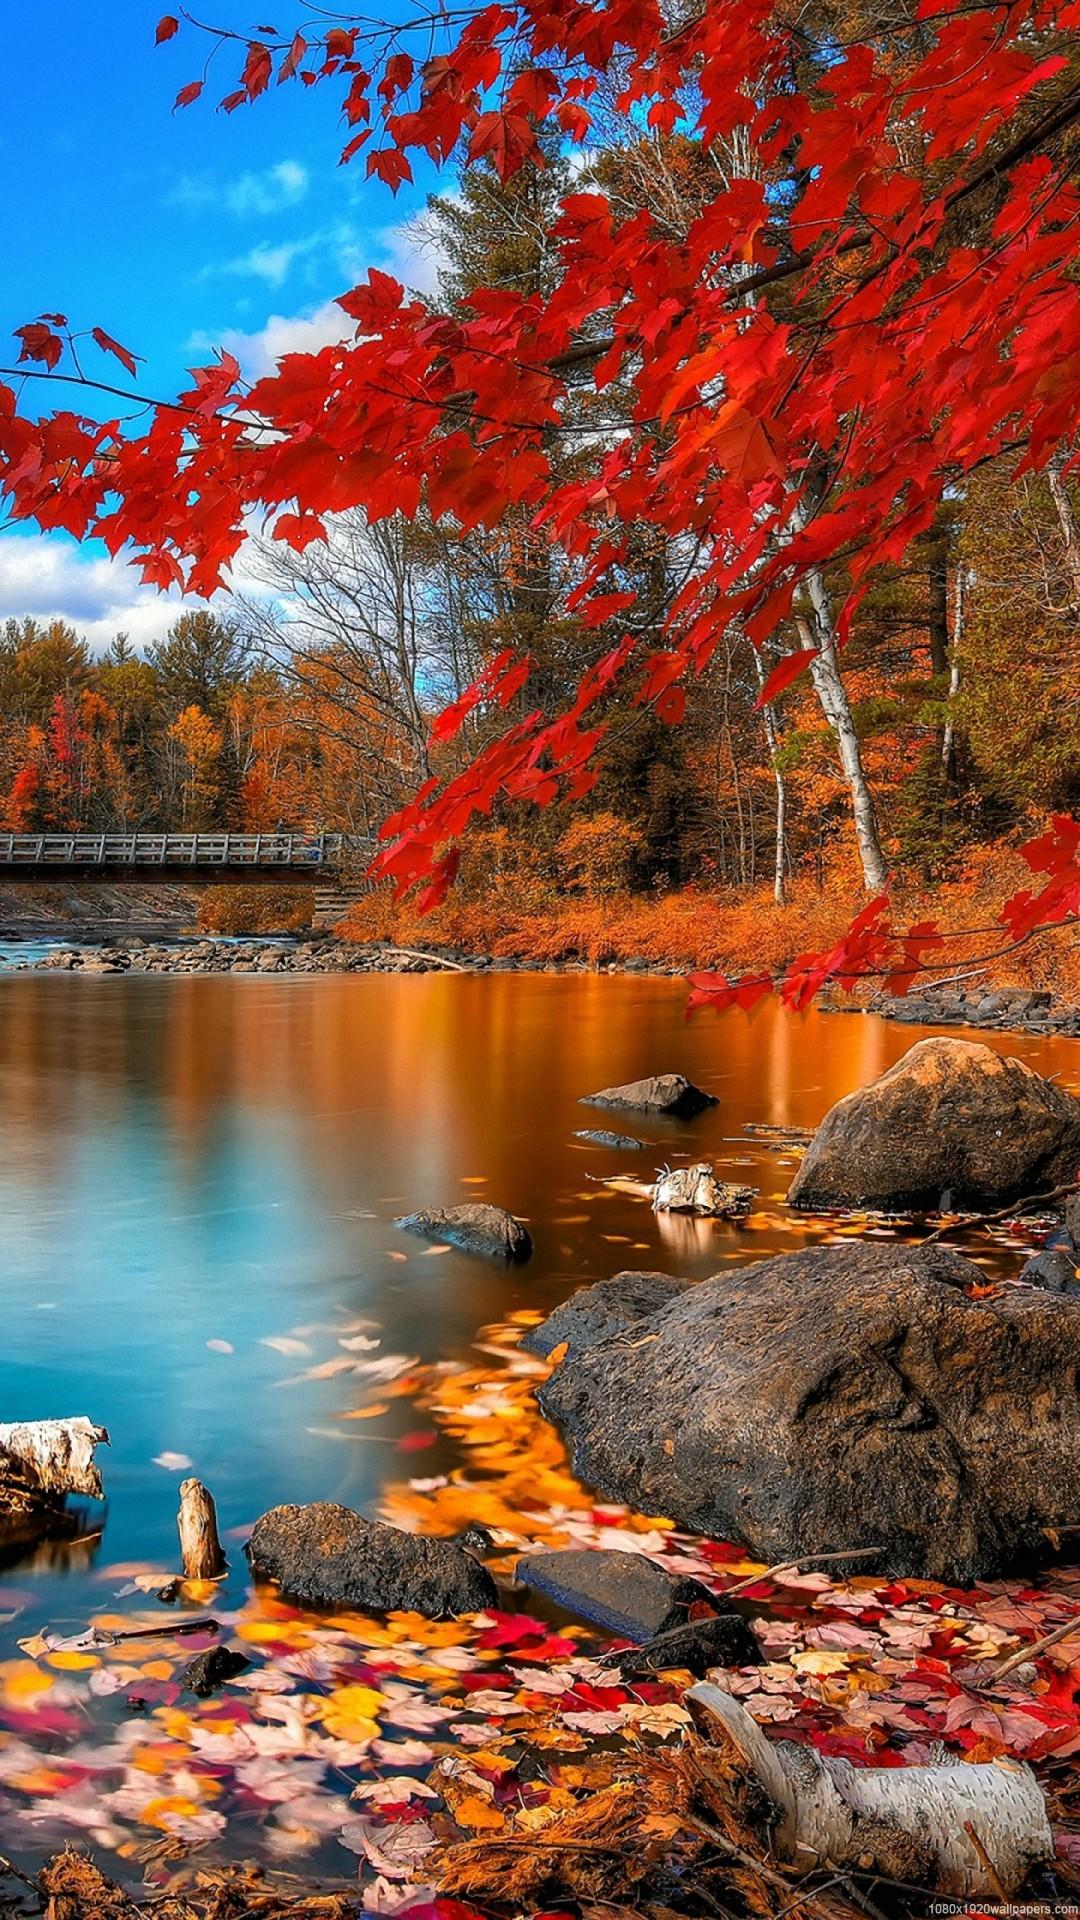 Autumn/fall foliage reflected on pond